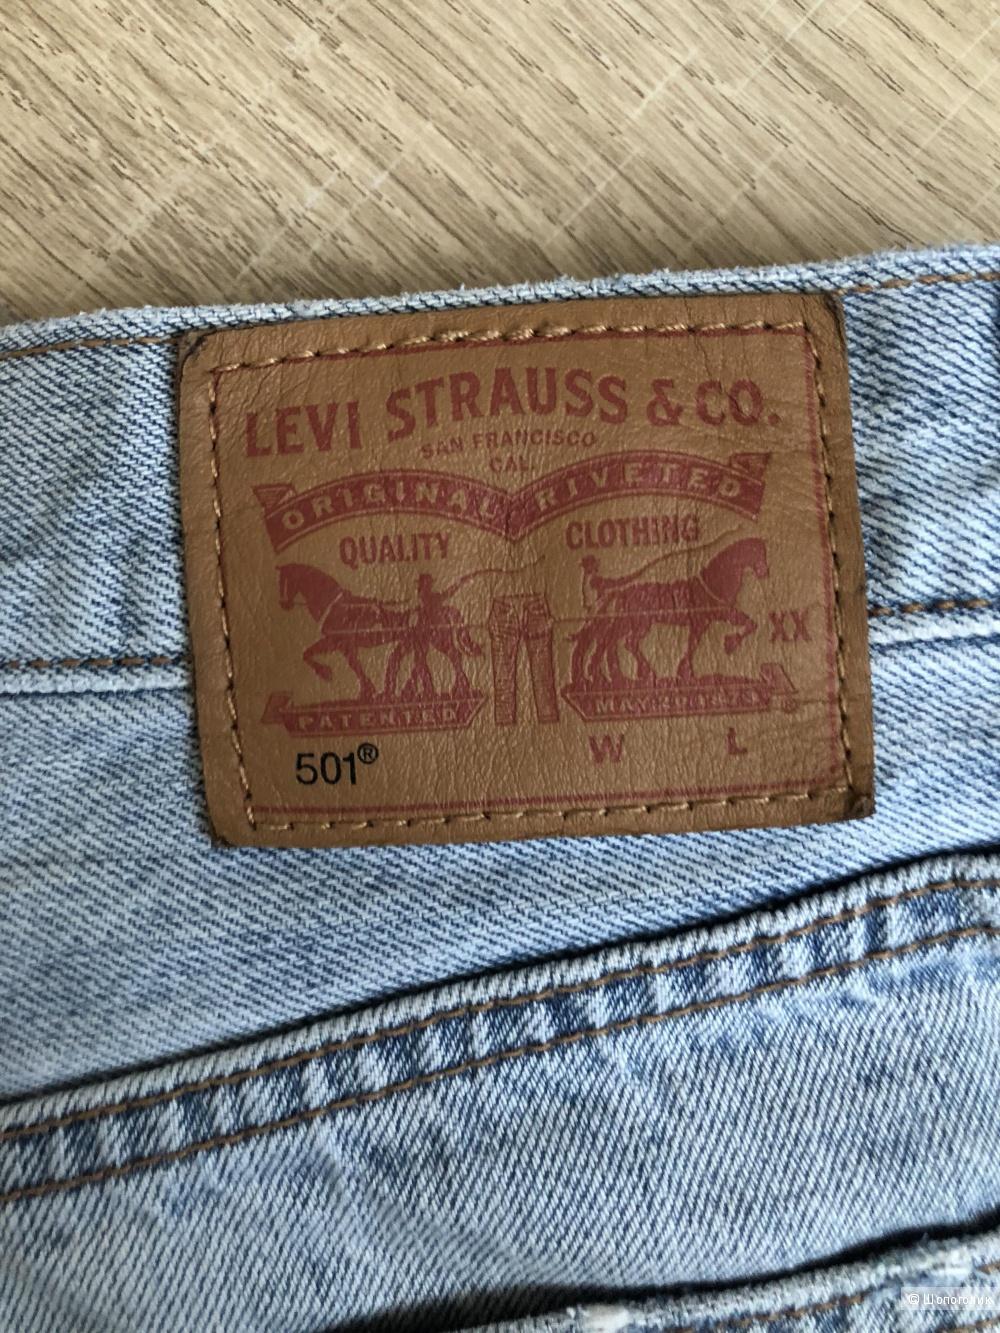 Шорты Levi's 501, размер 25